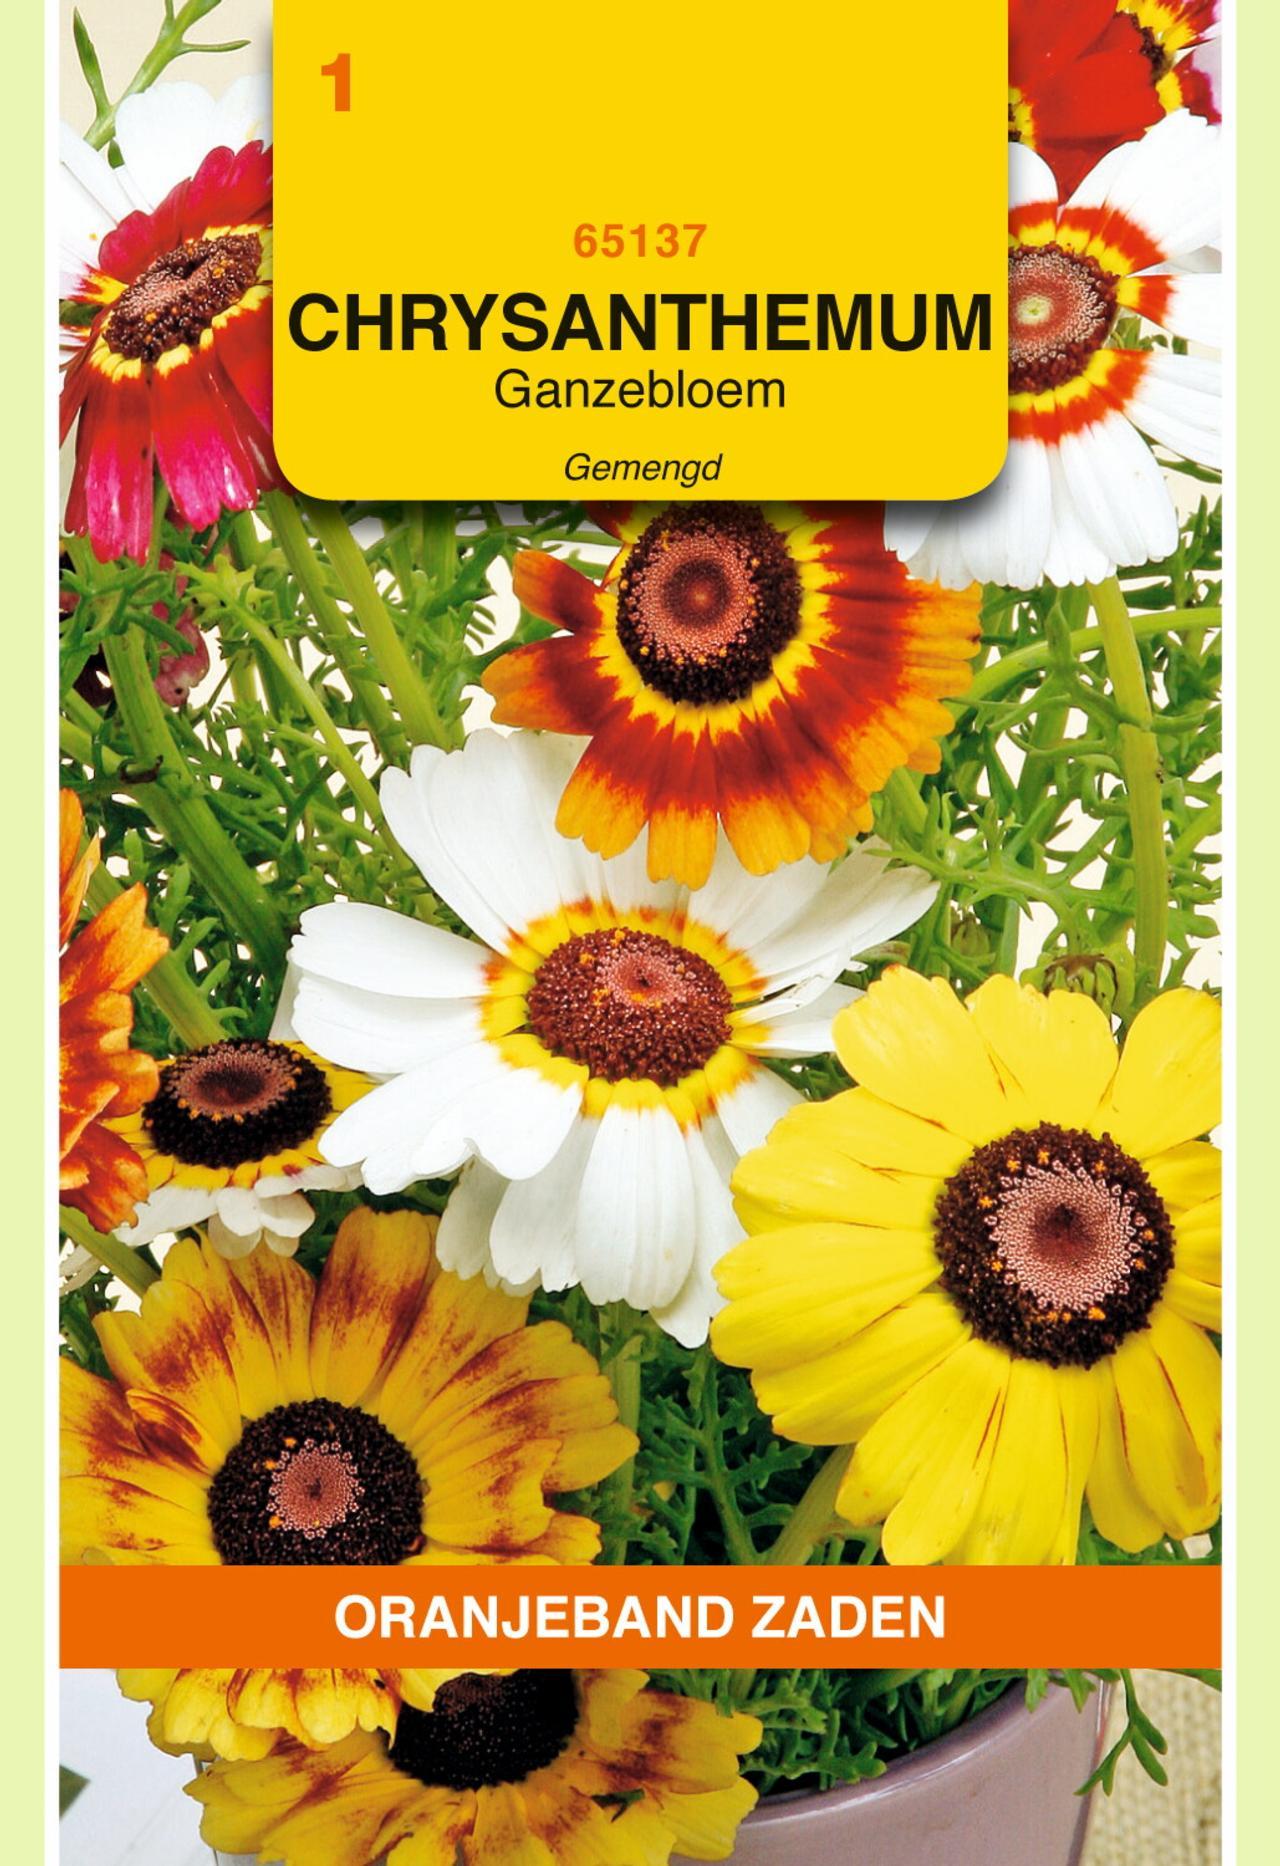 Chrysanthemum carinatum plant